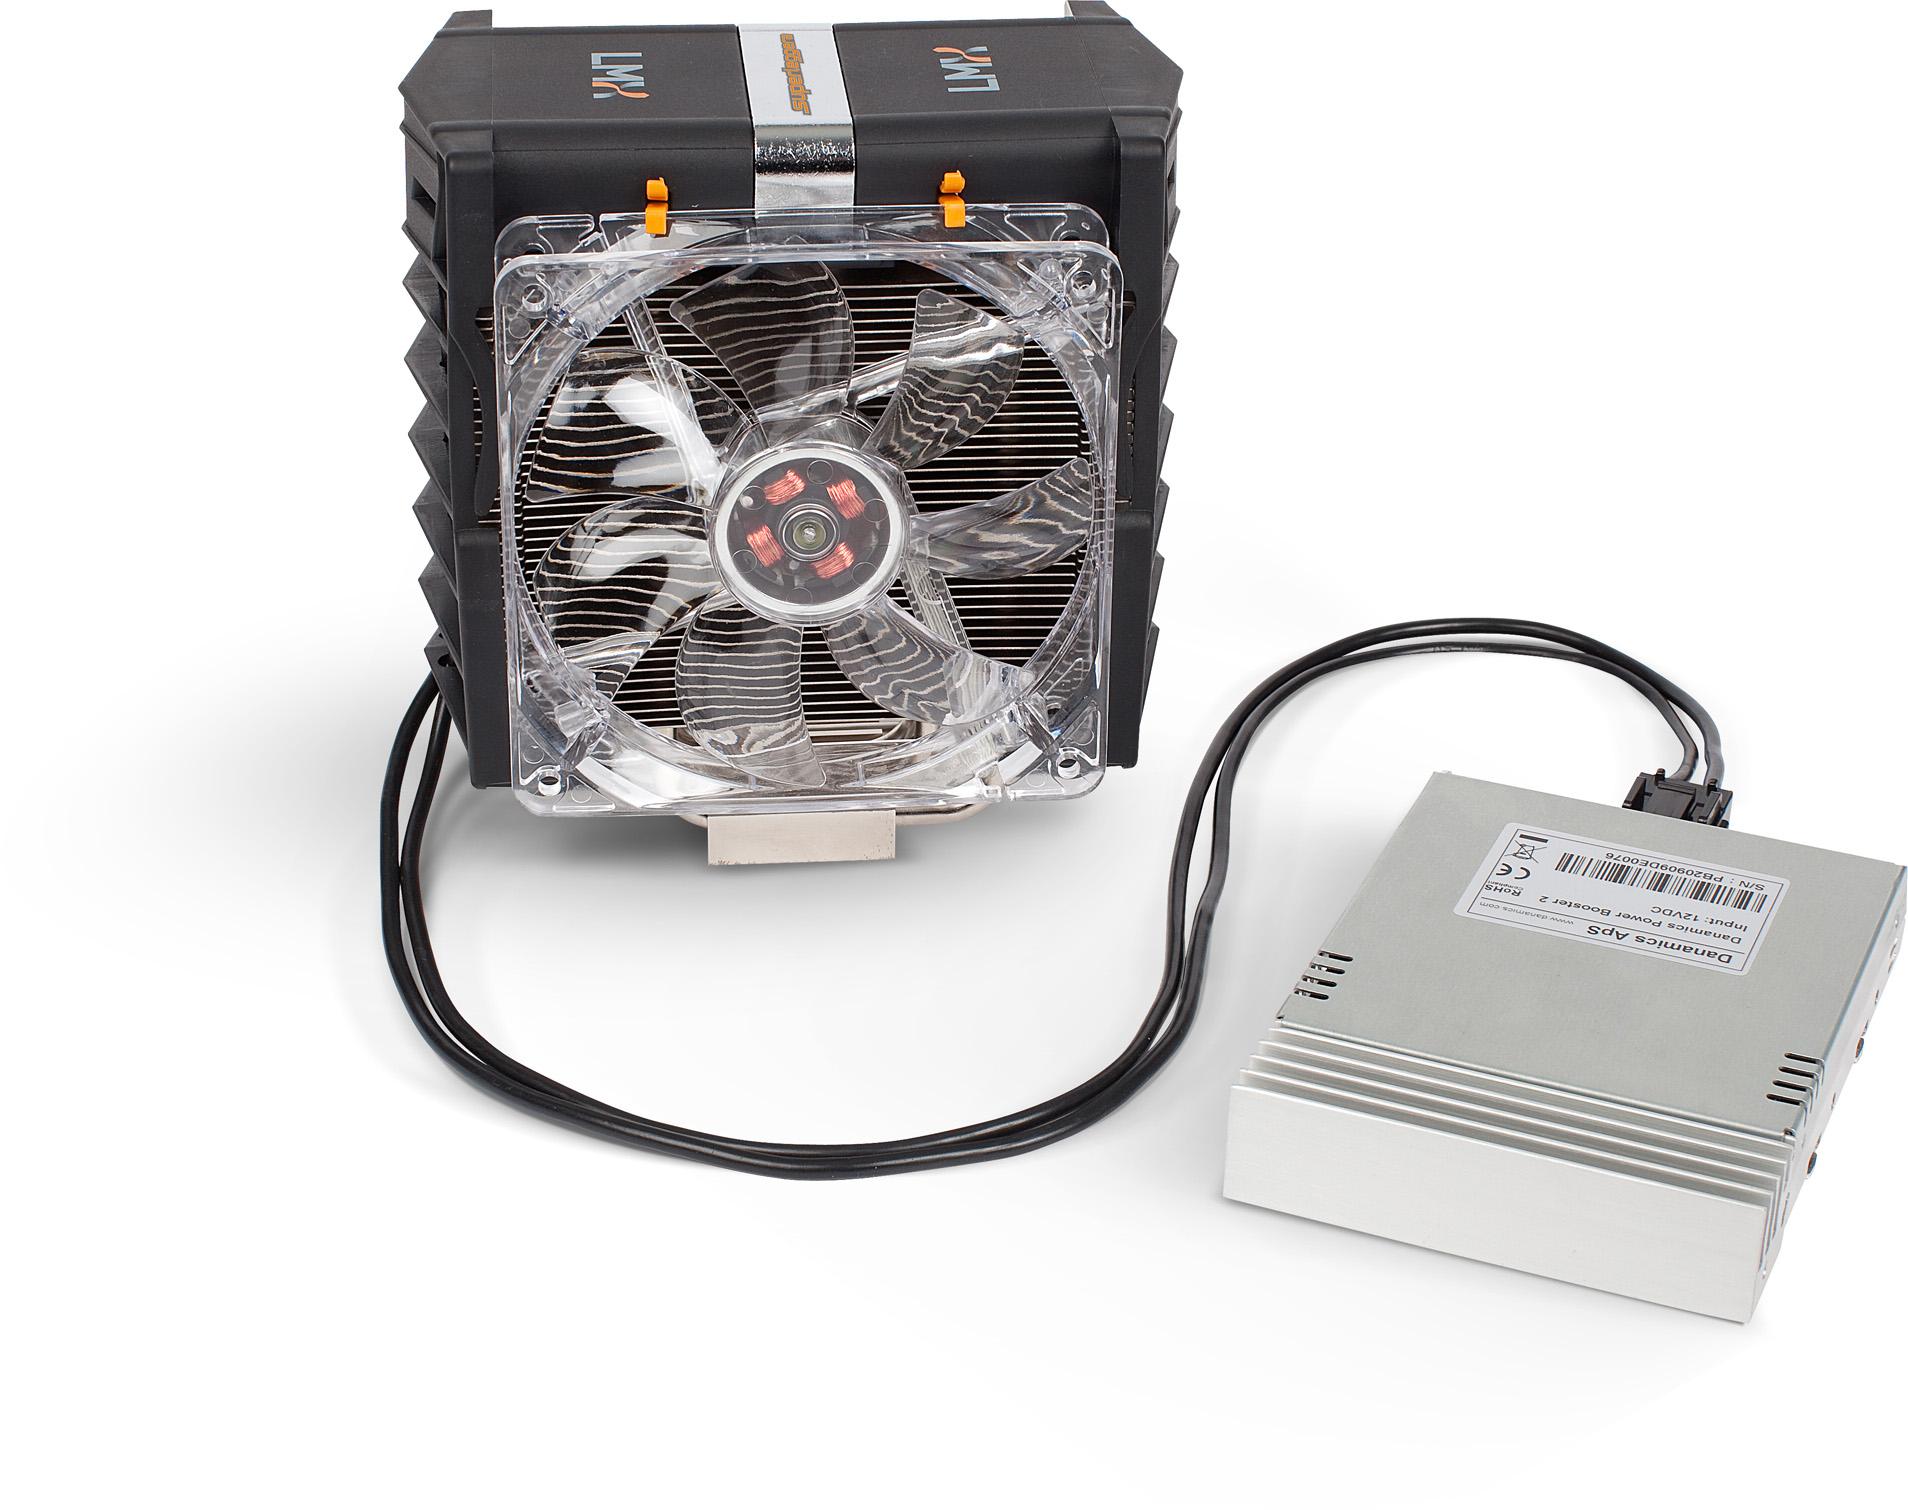 Danamics LMX Superleggera plus PowerBooster connected frontview 50